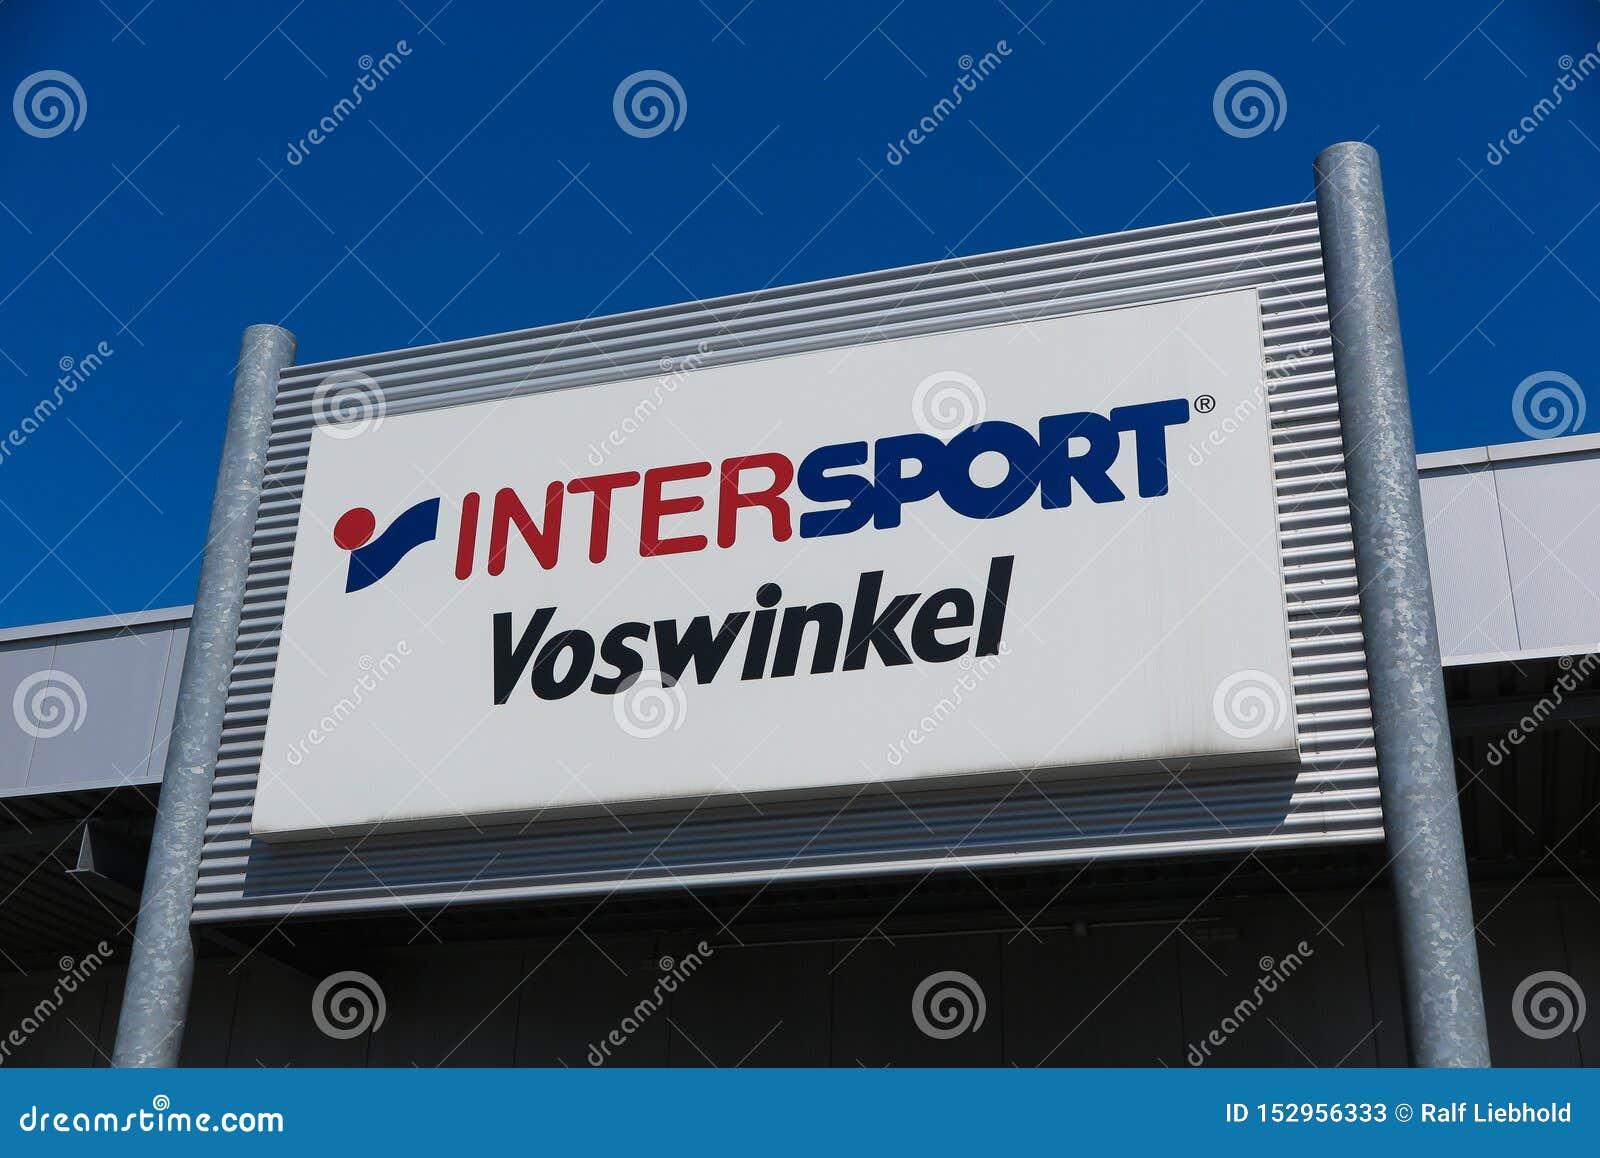 TOENISVORST, GERMANY - JUIN 28. 2019: Close up of logo against blue sky of Intersport Vosswinkel German chain for sports supplies